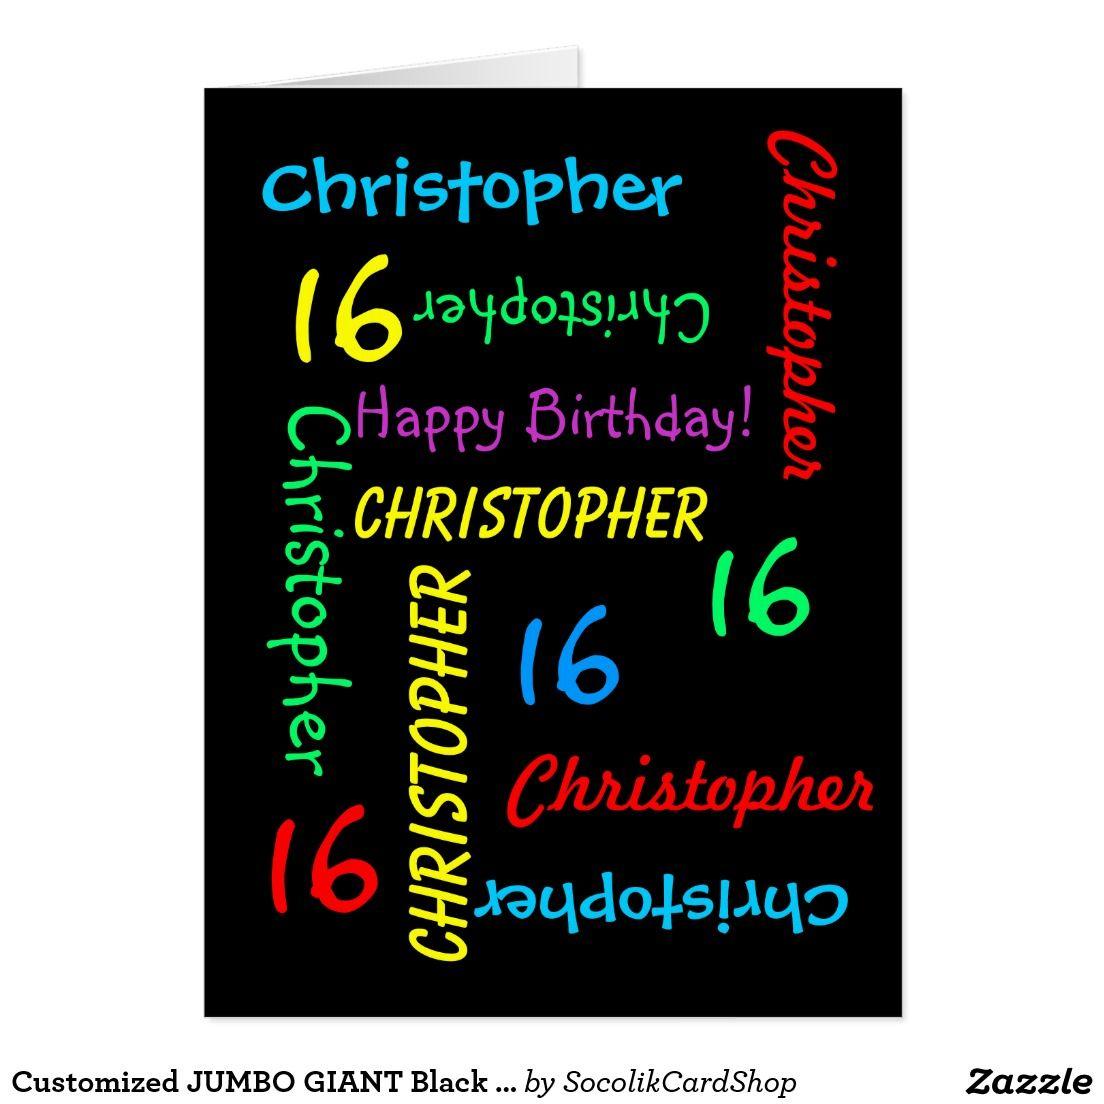 Customized Jumbo Giant Black Birthday Card Any Age Birthday